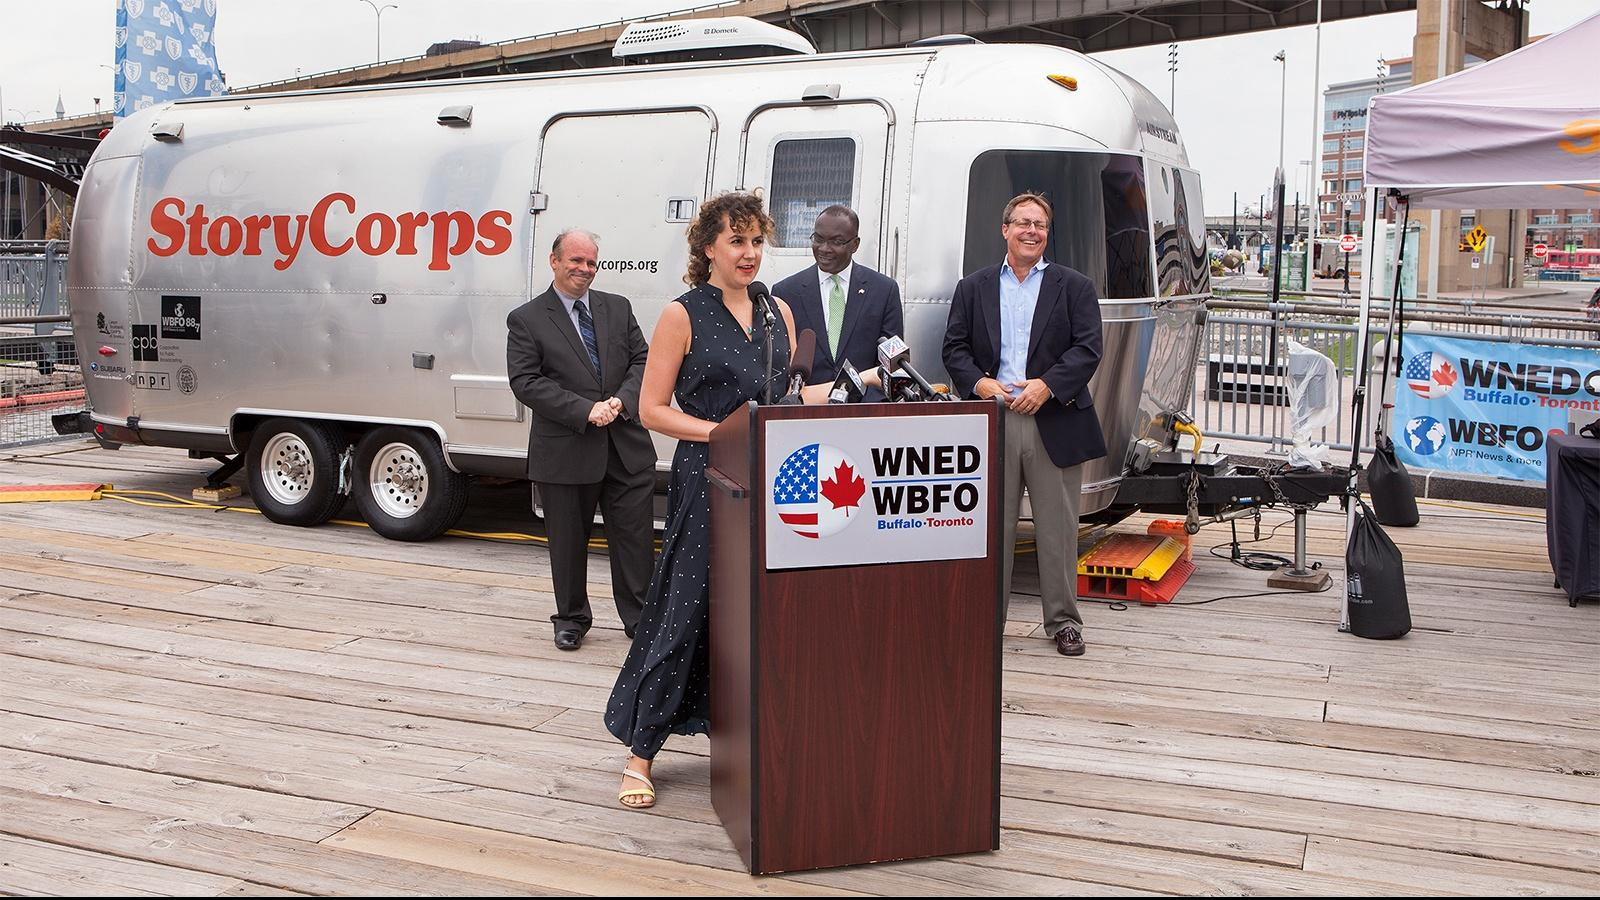 WBFO Hosts StoryCorps Visit to Buffalo